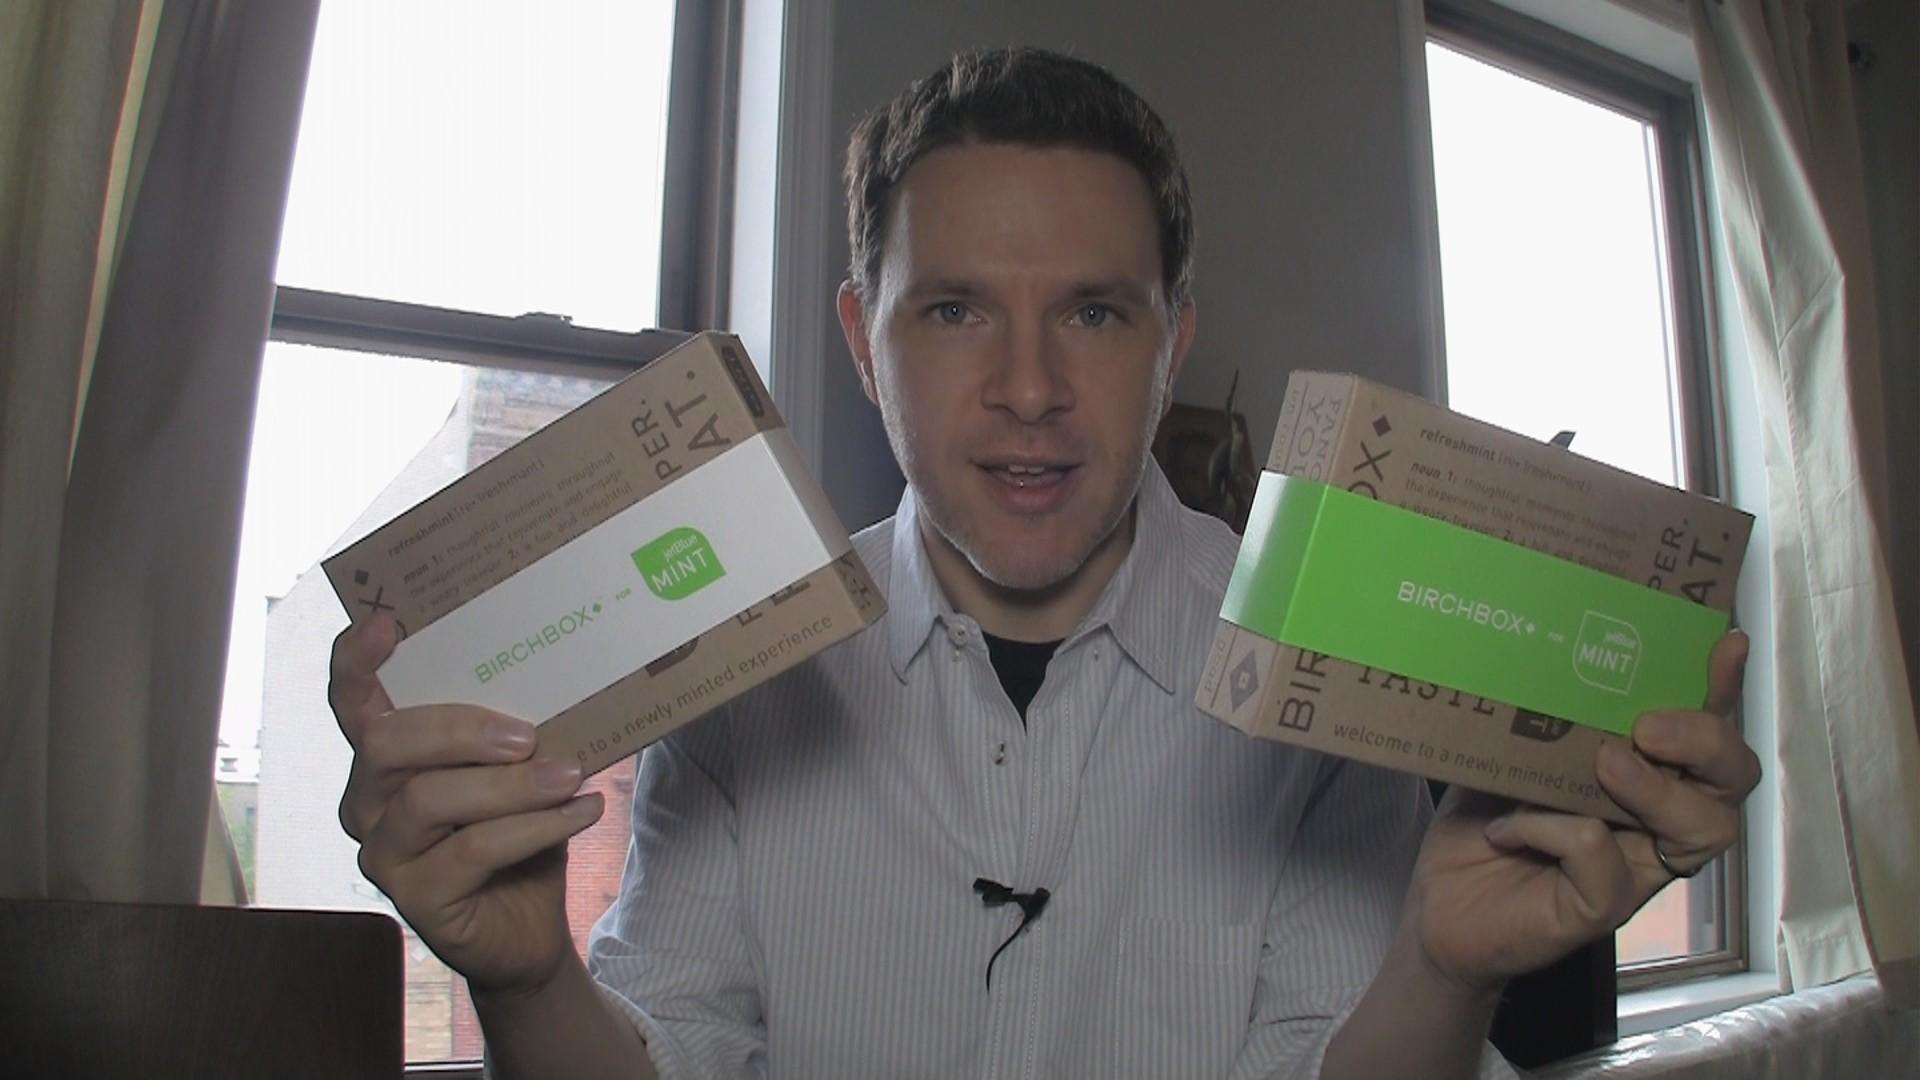 Birchbox Amenity Kits for JetBlue